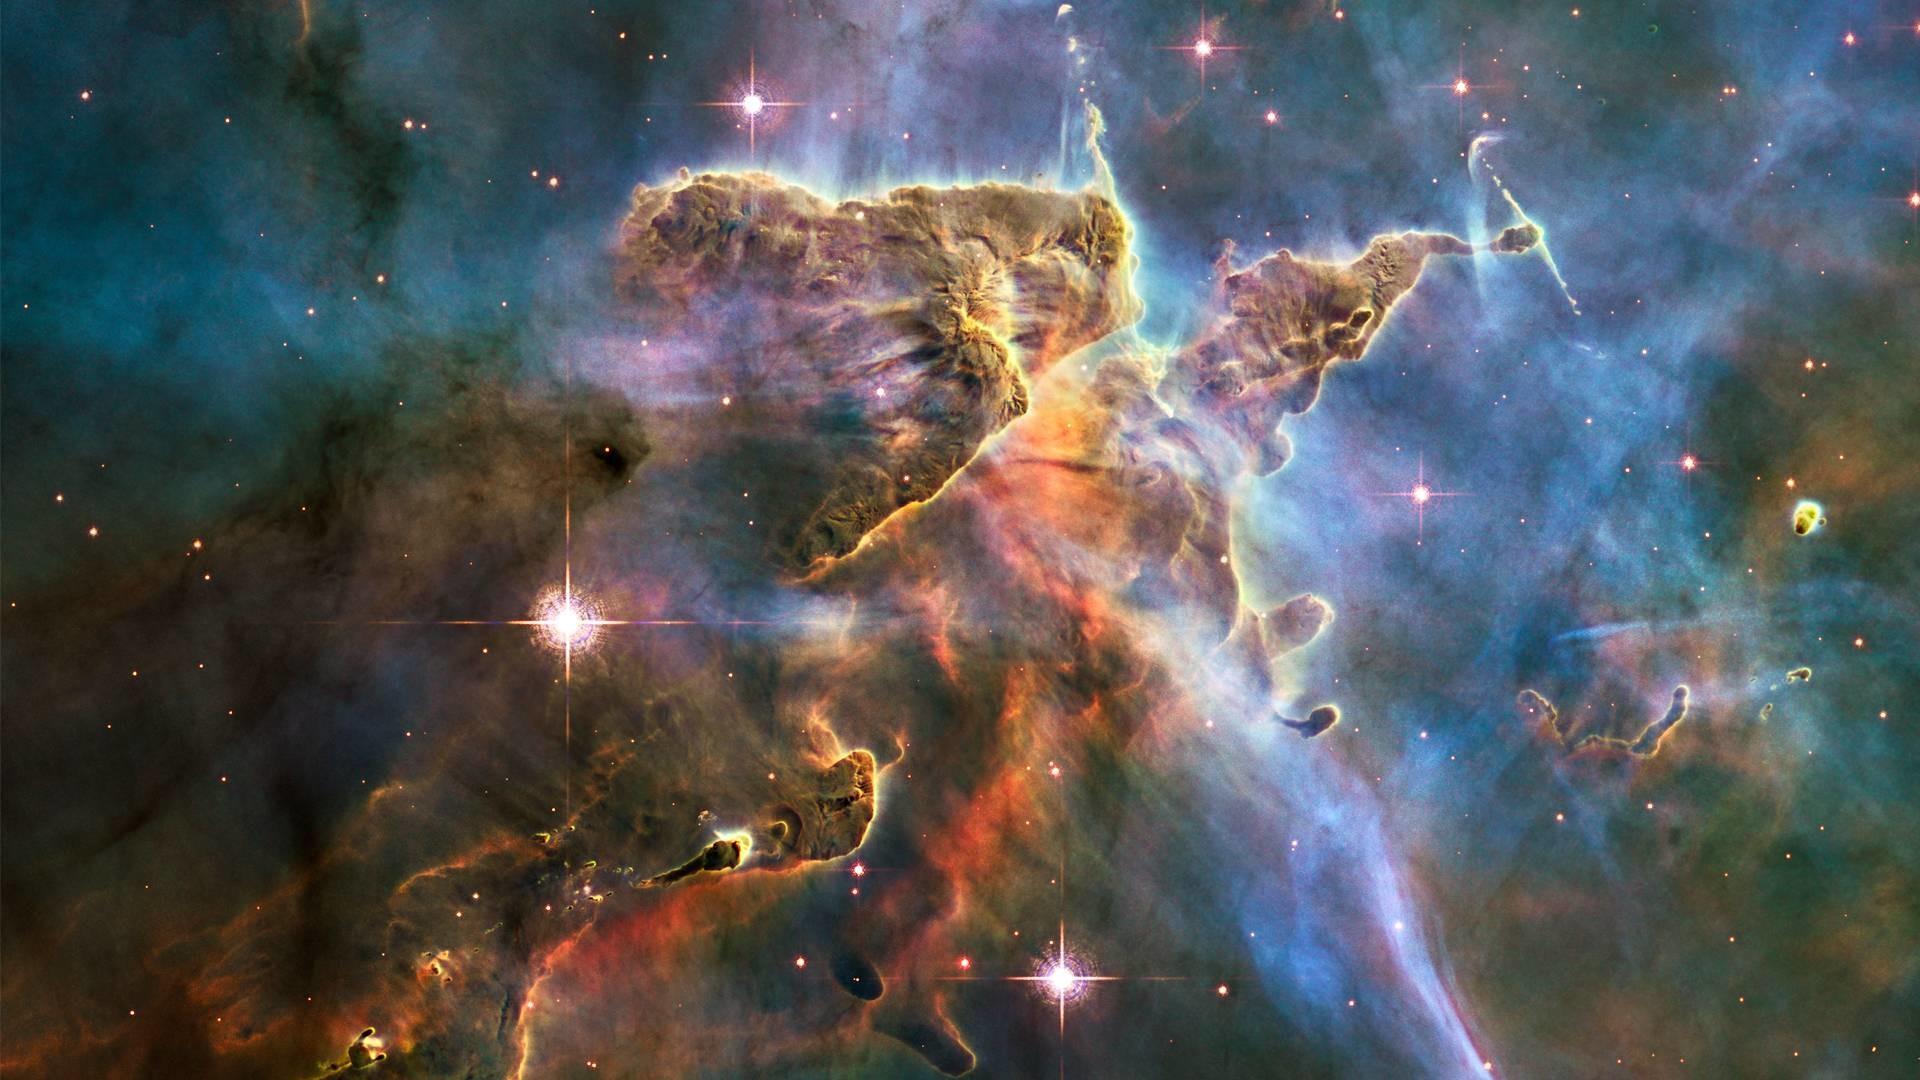 Dark Nebula wallpapers | PostersandPics.com | Pinterest | Nebula wallpaper